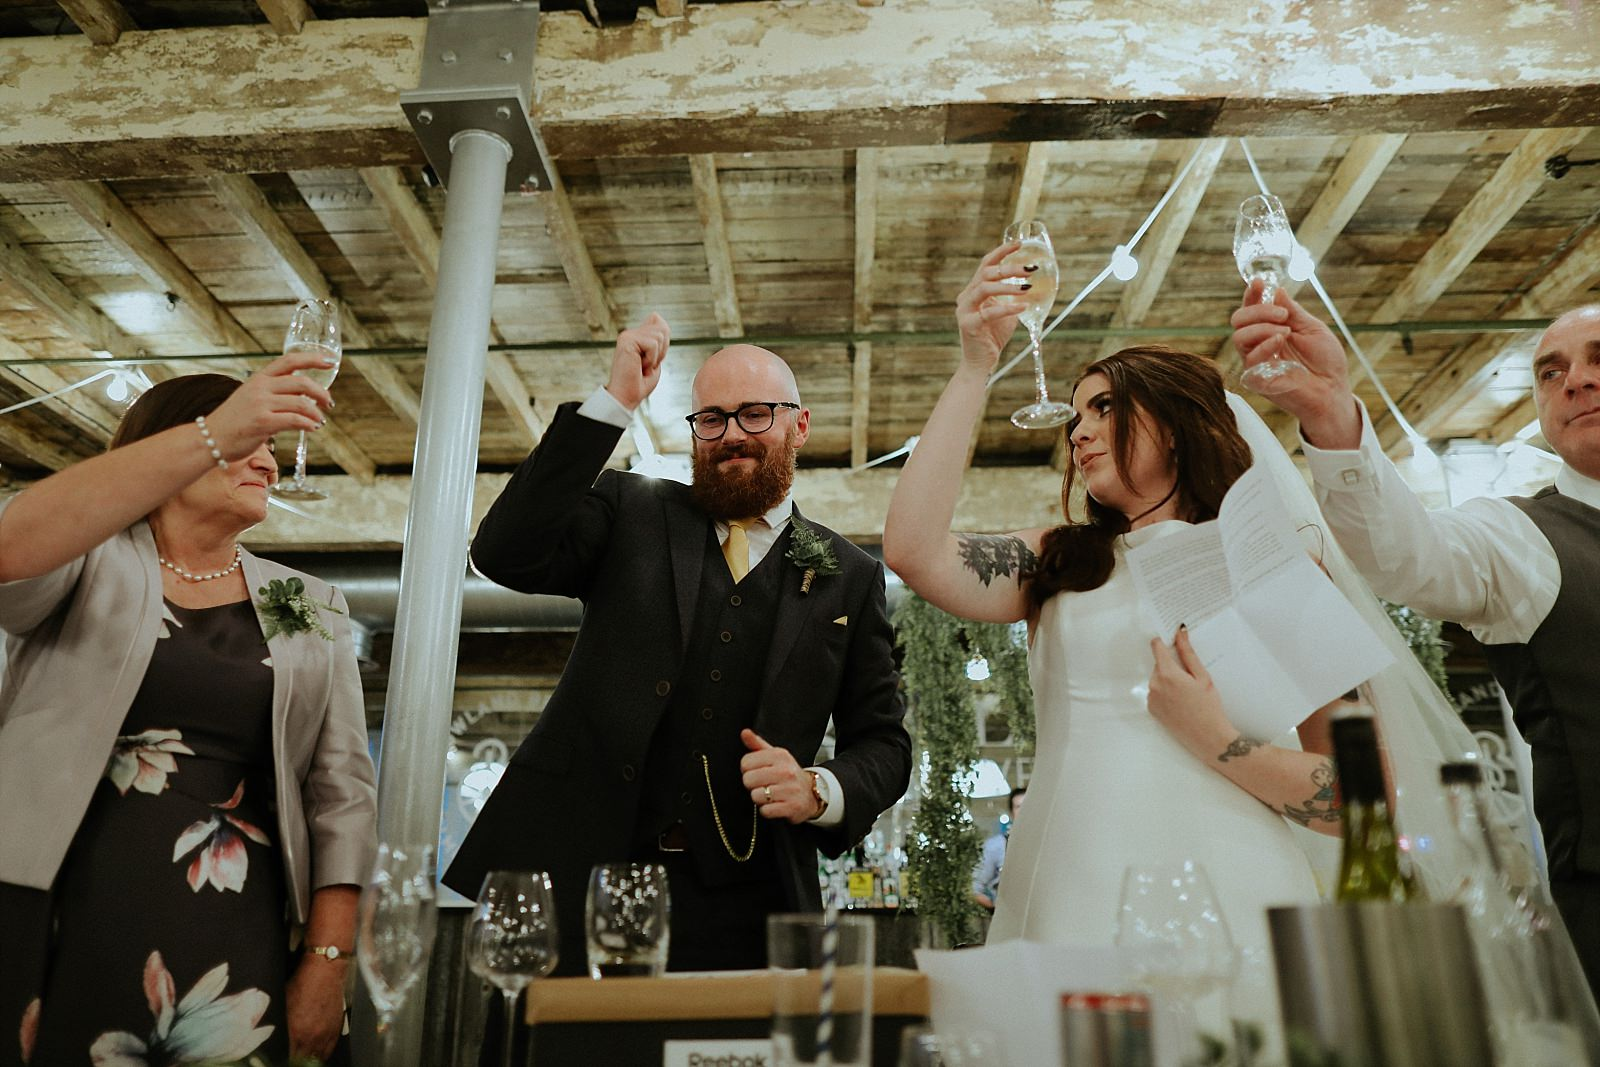 hip hooray for the groom